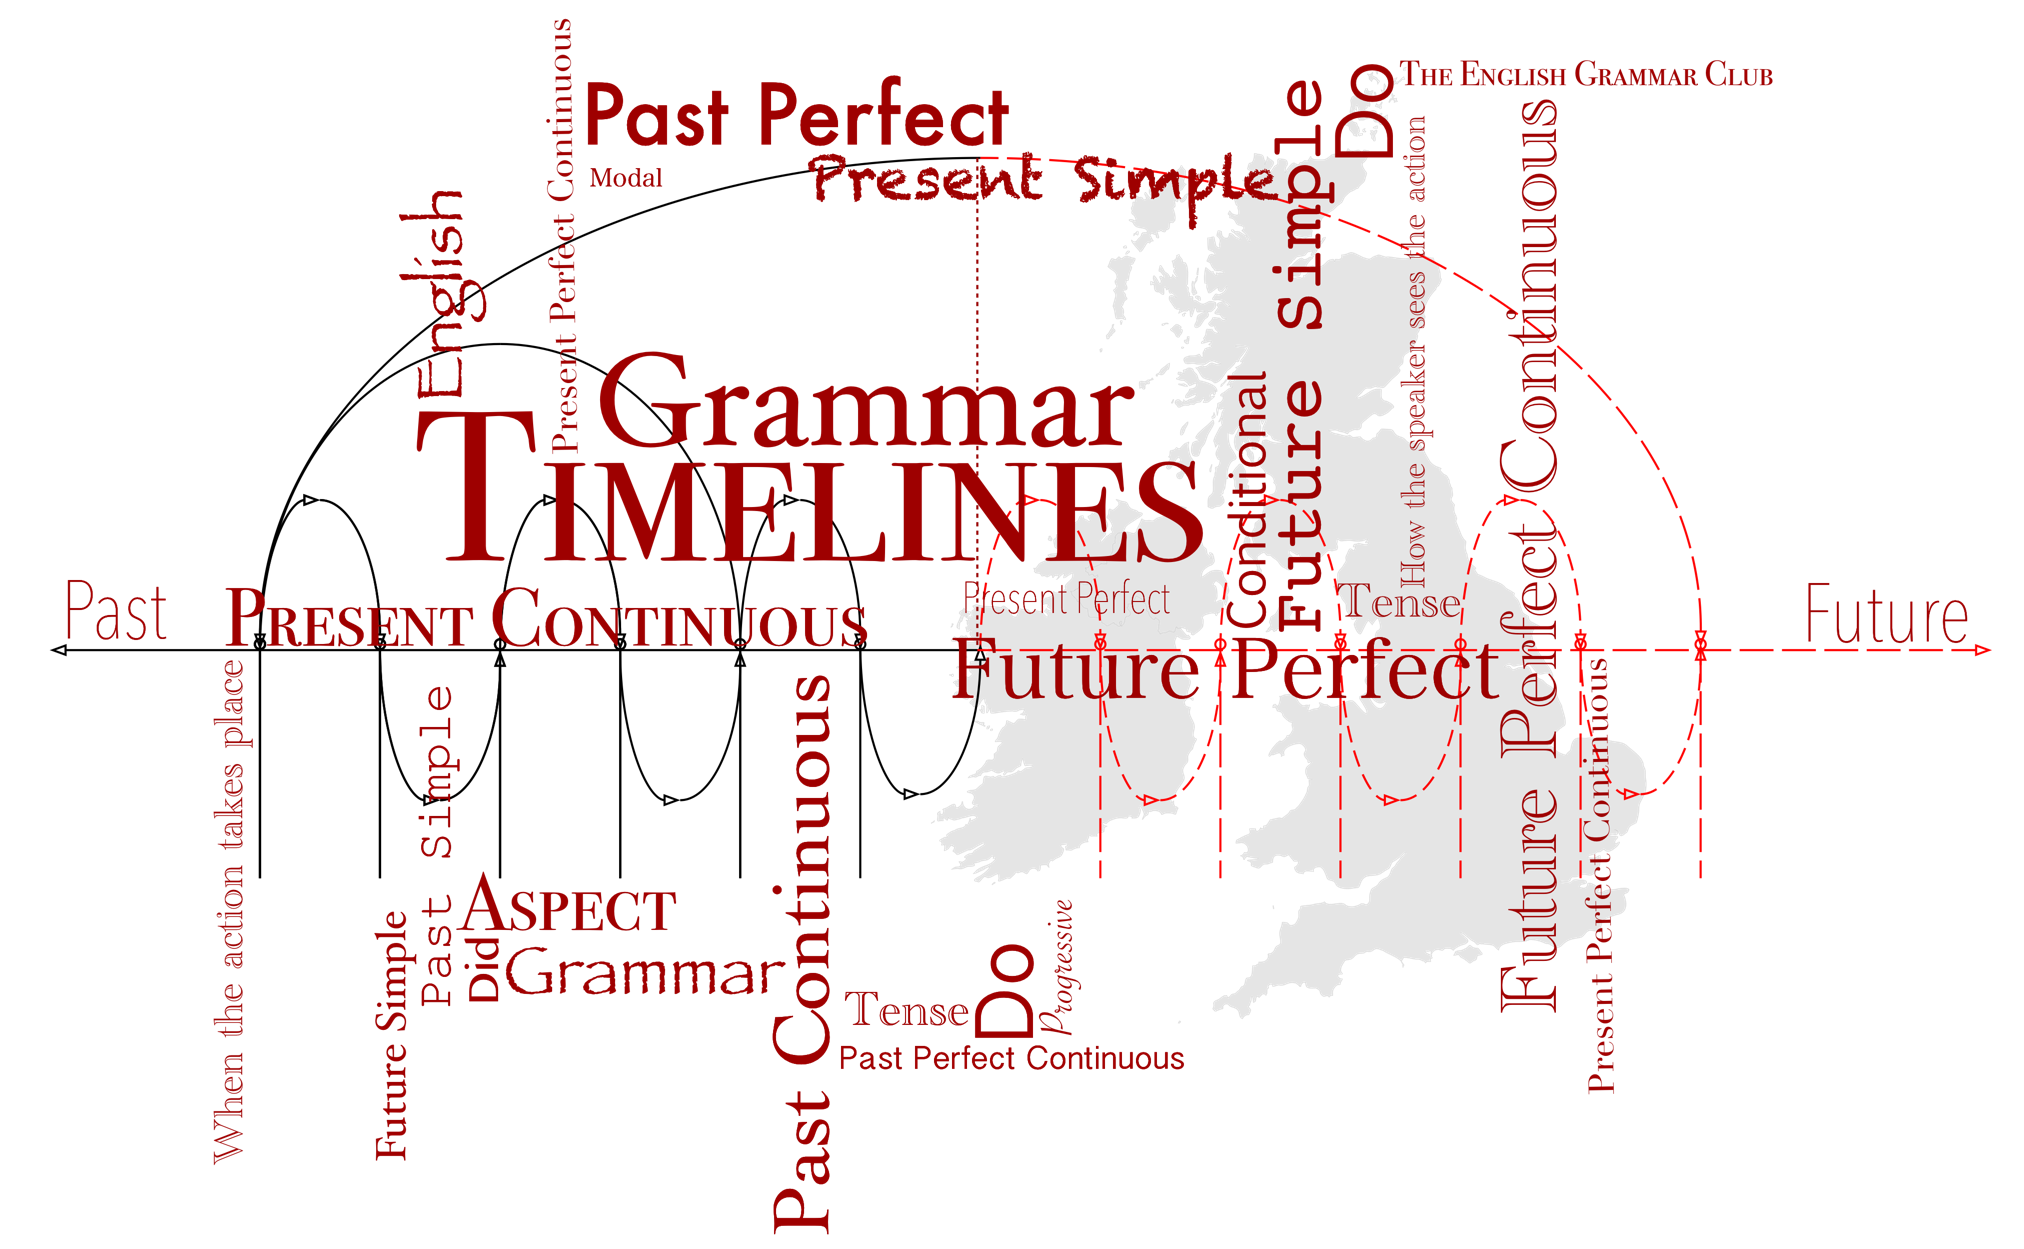 English Grammar Timelines